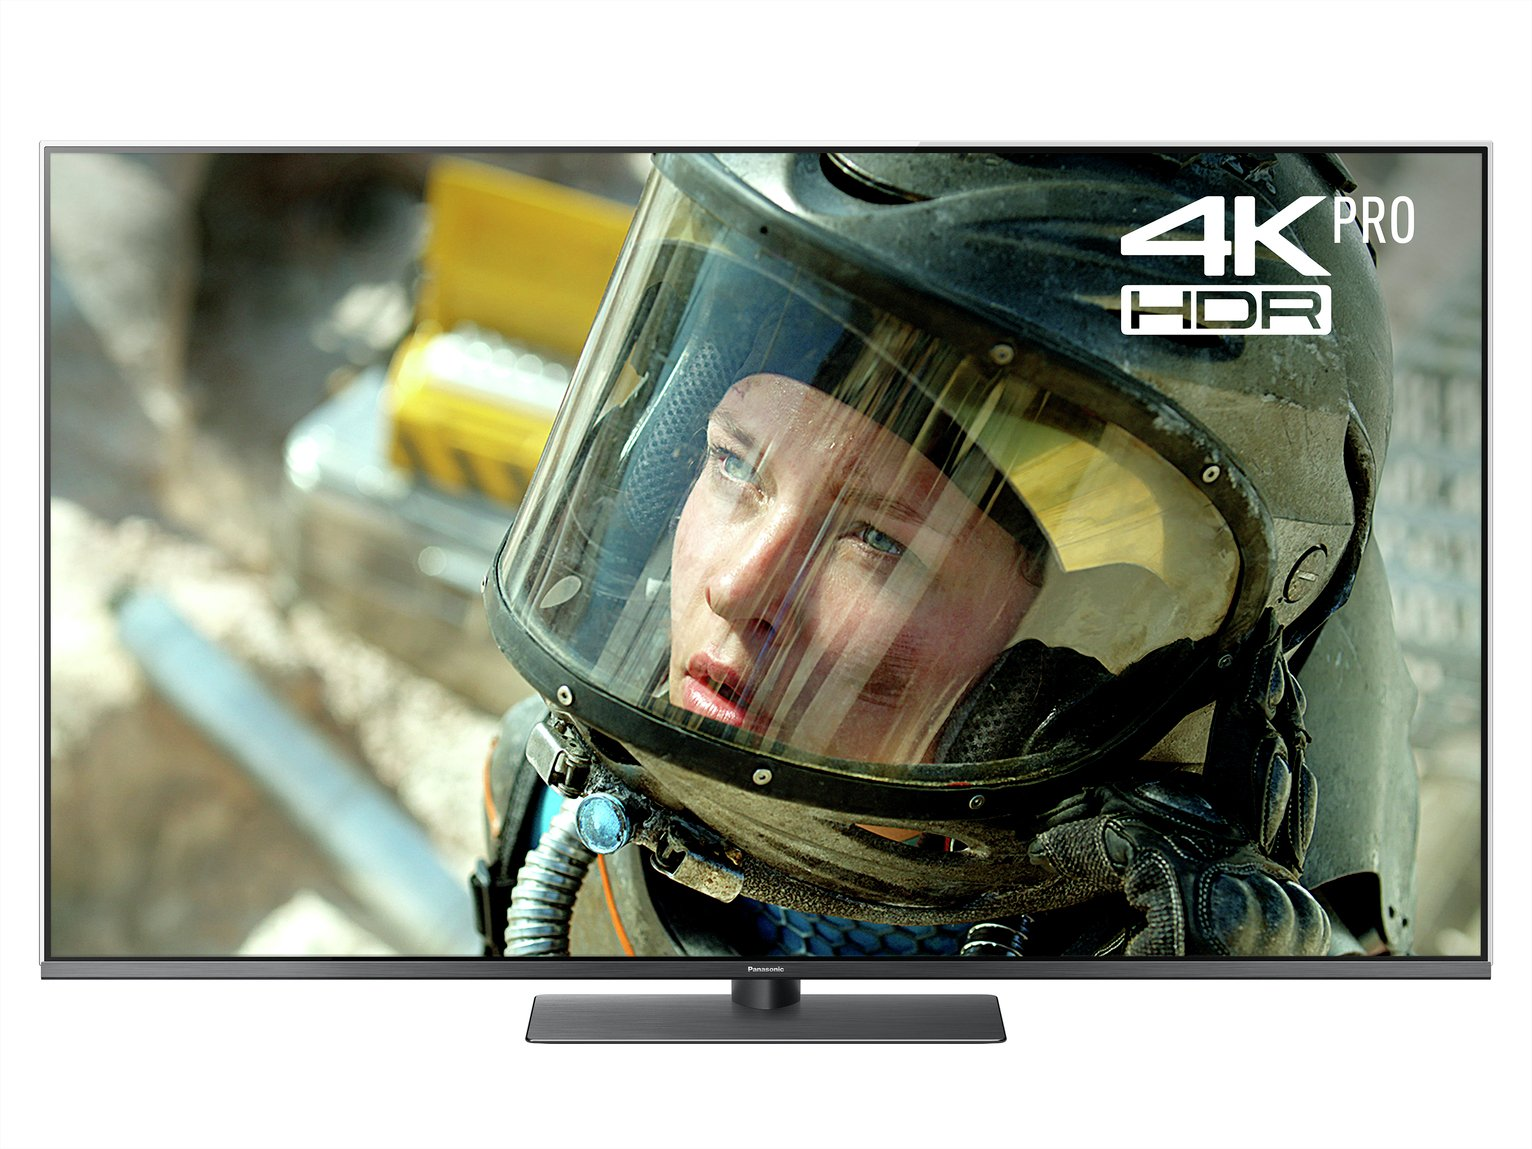 Panasonic 49 Inch TX-49FX750B Smart 4K UHD TV with HDR